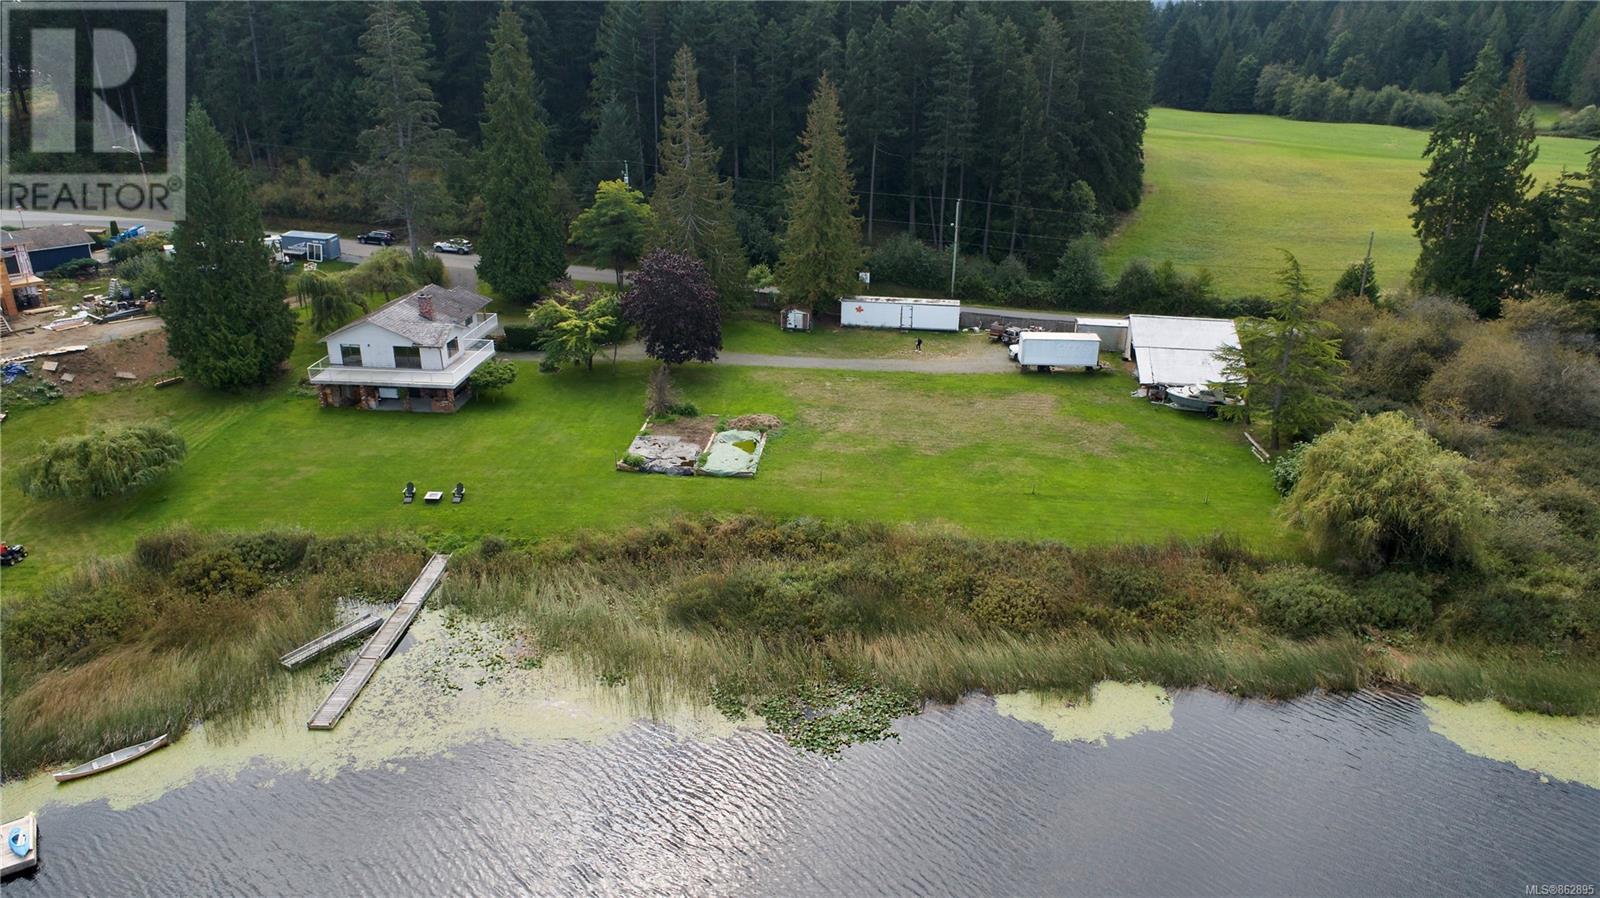 6690 Jenkins Rd, Nanaimo, British Columbia  V9T 6G8 - Photo 39 - 862895